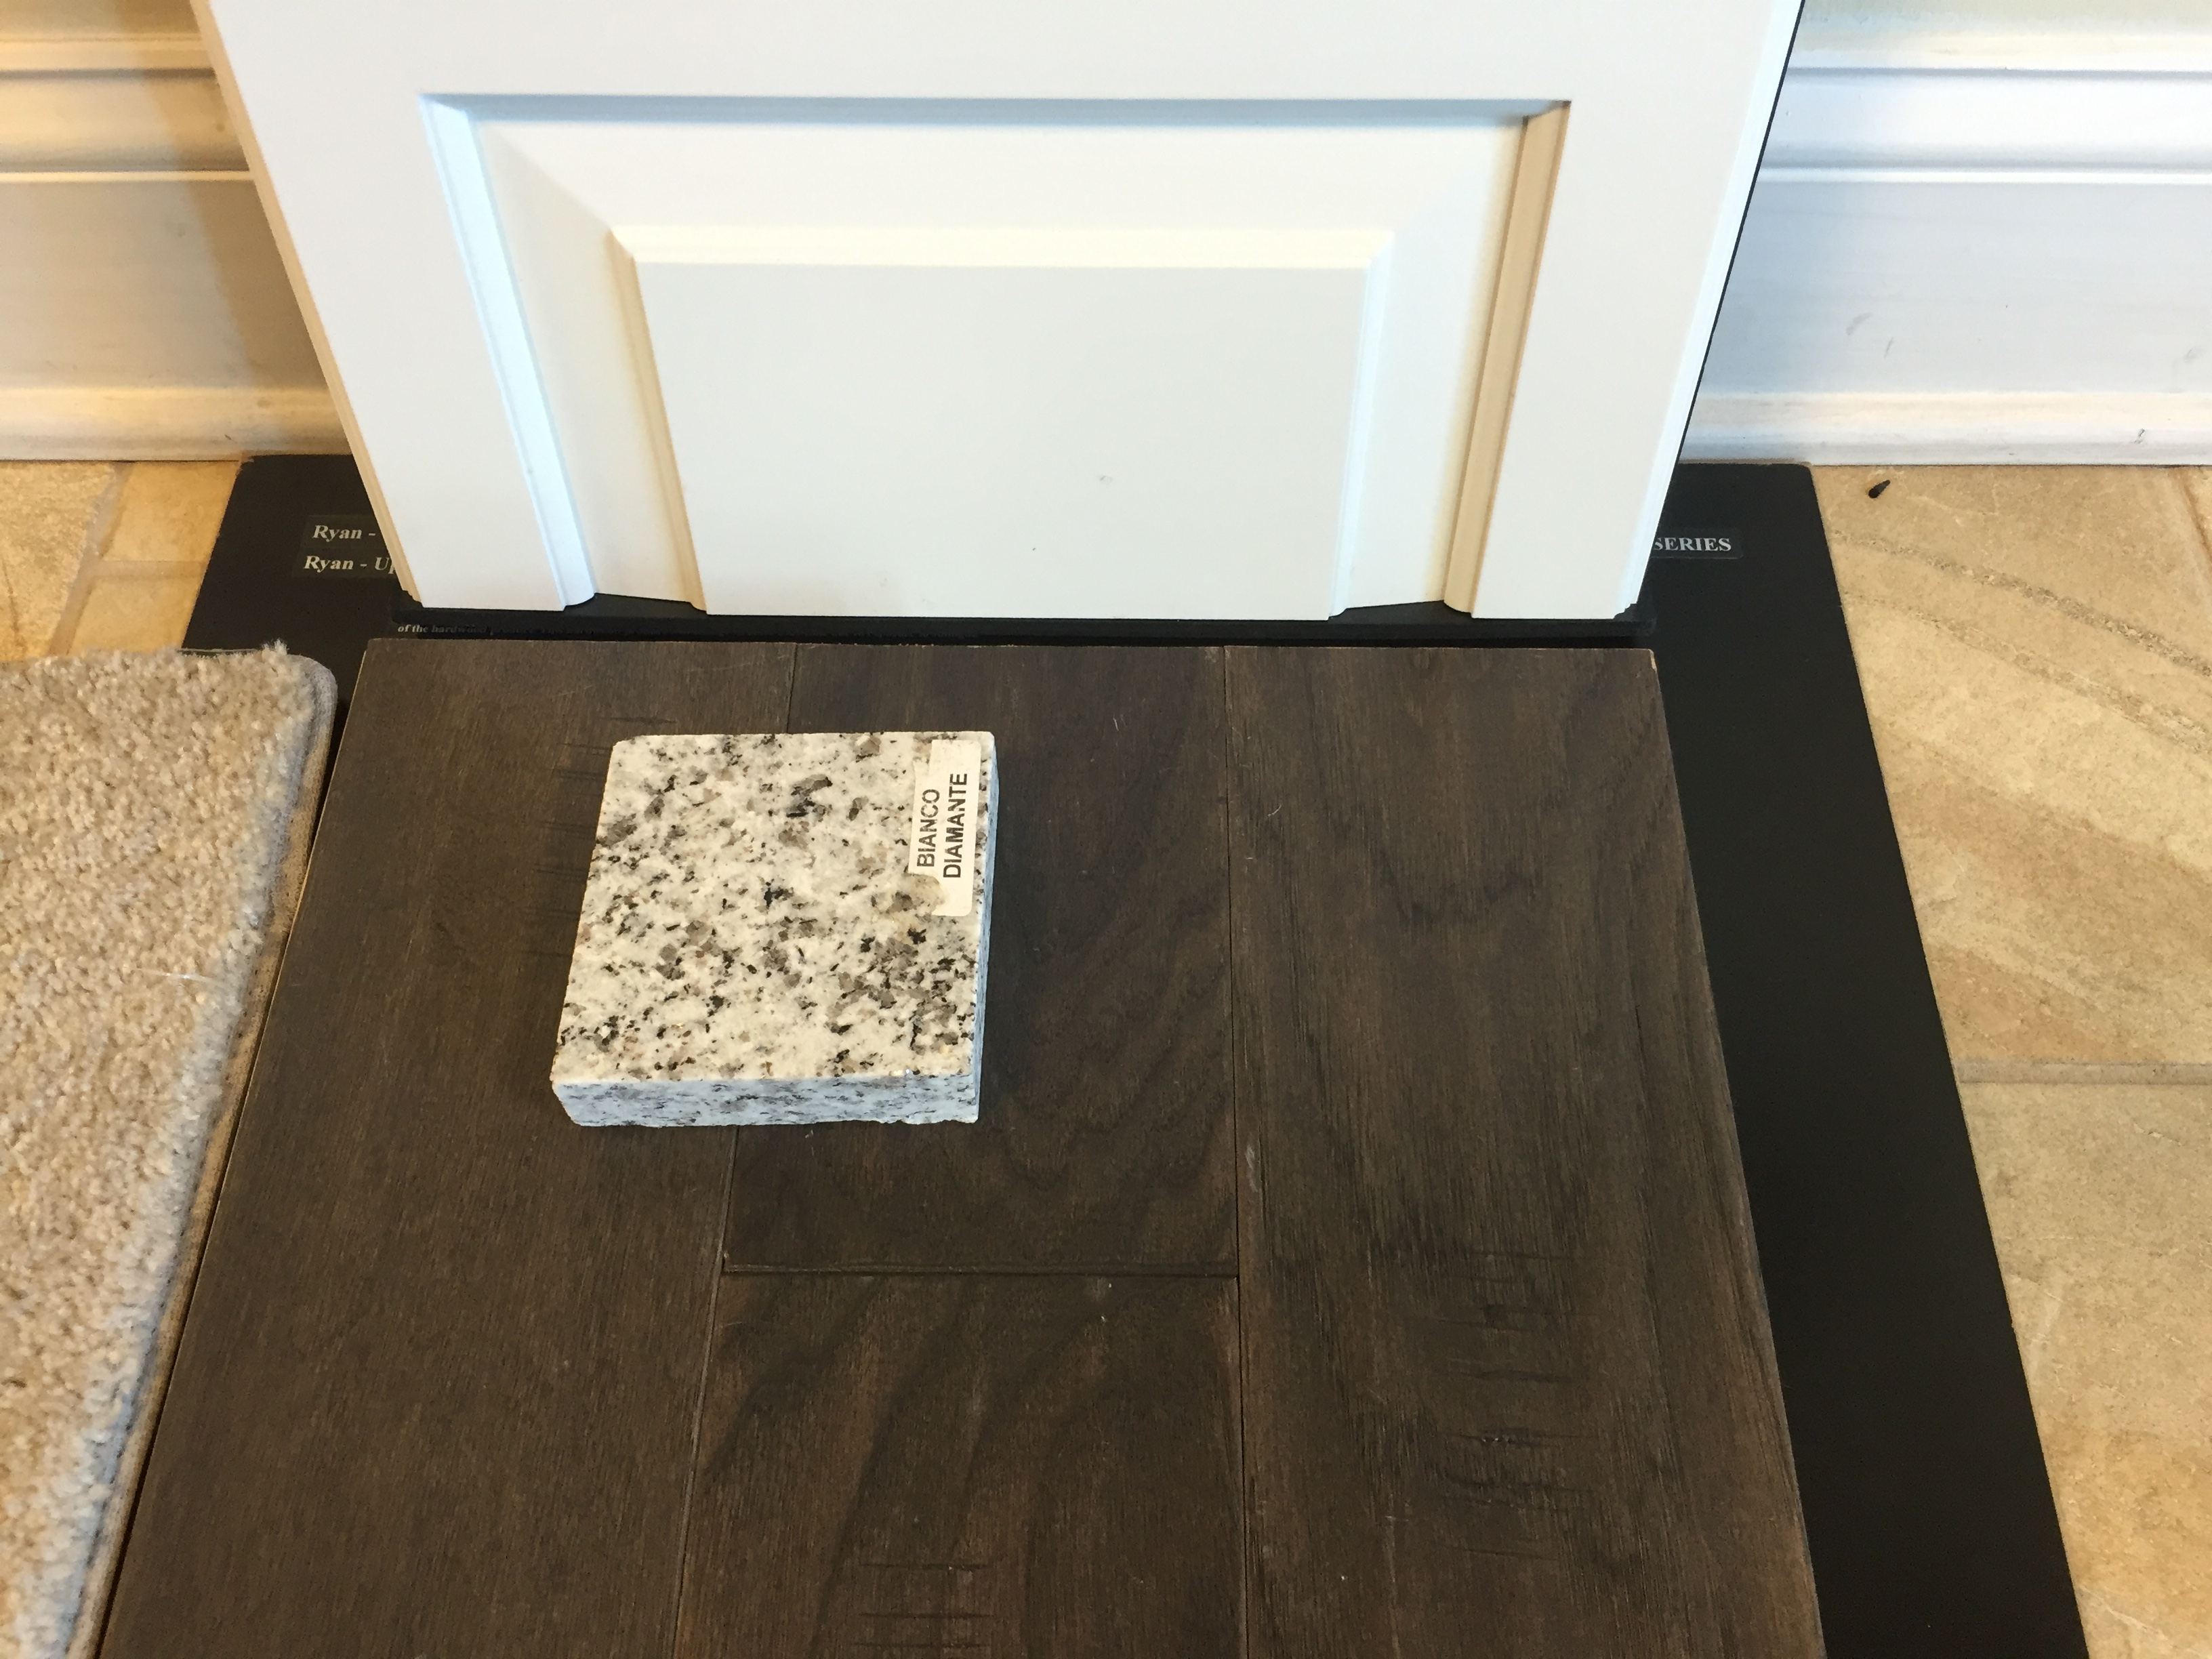 Wonderful 1 X 1 Ceiling Tiles Huge 12X12 Ceramic Tiles Clean 13X13 Floor Tile 2 X4 Ceiling Tiles Young 2X4 Drop Ceiling Tiles Coloured2X6 Subway Tile T.A.C. Ceramic \u0026 Tile Appointment: Sept 2 2016 \u2013 Strauss Attic At ..